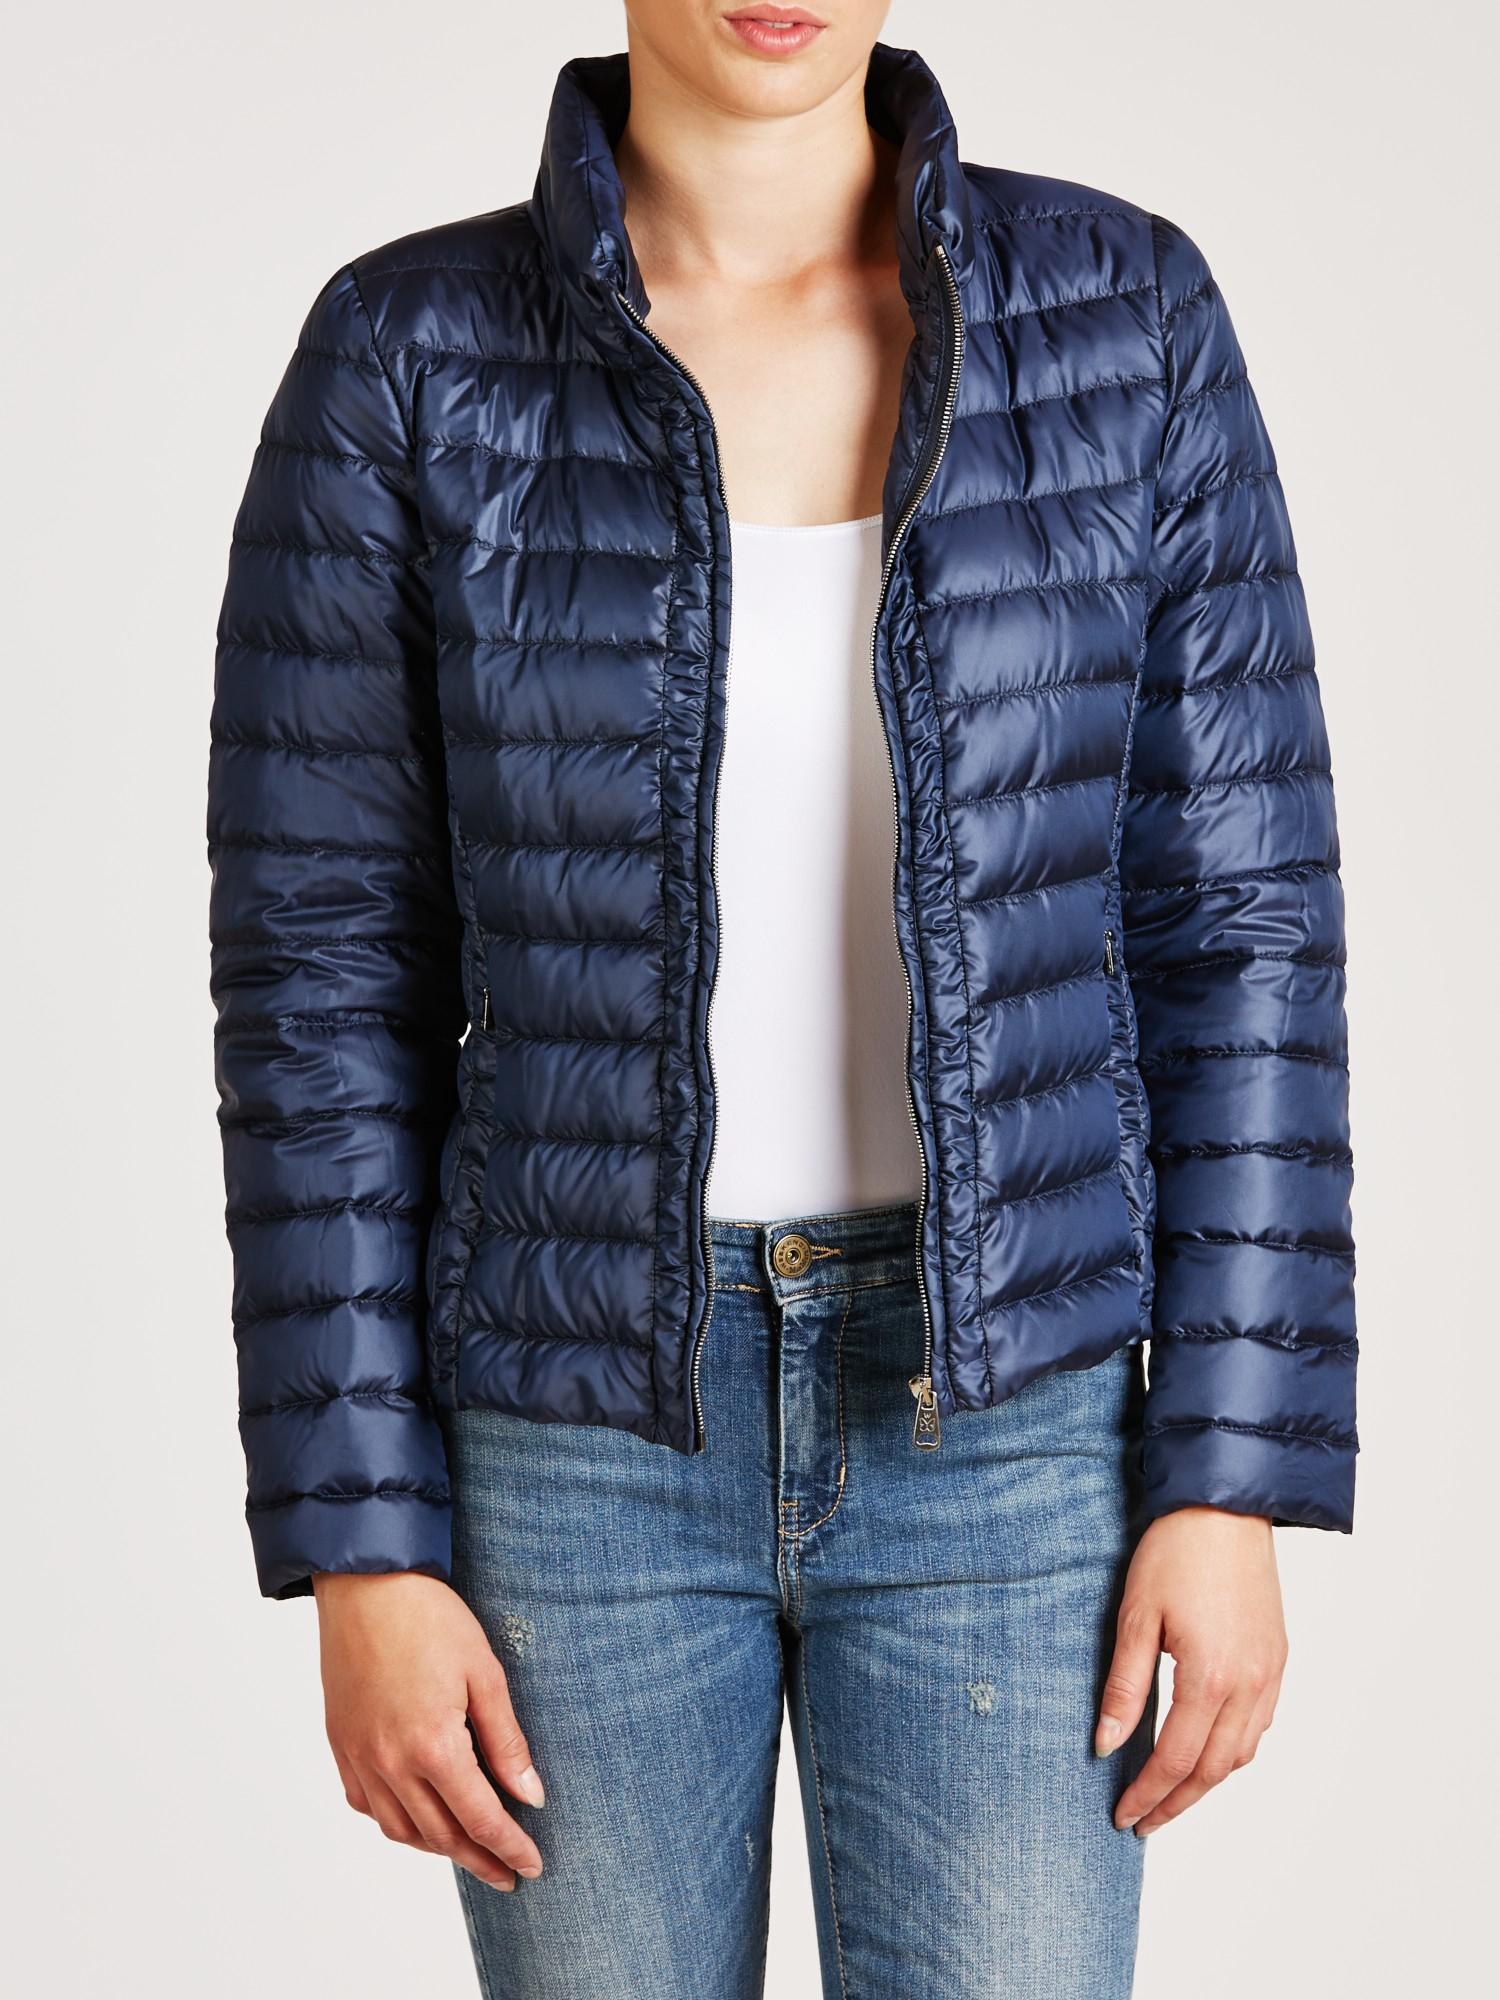 Lyst - Weekend by maxmara Perim Quilted Jacket in Blue : max mara quilted jacket - Adamdwight.com